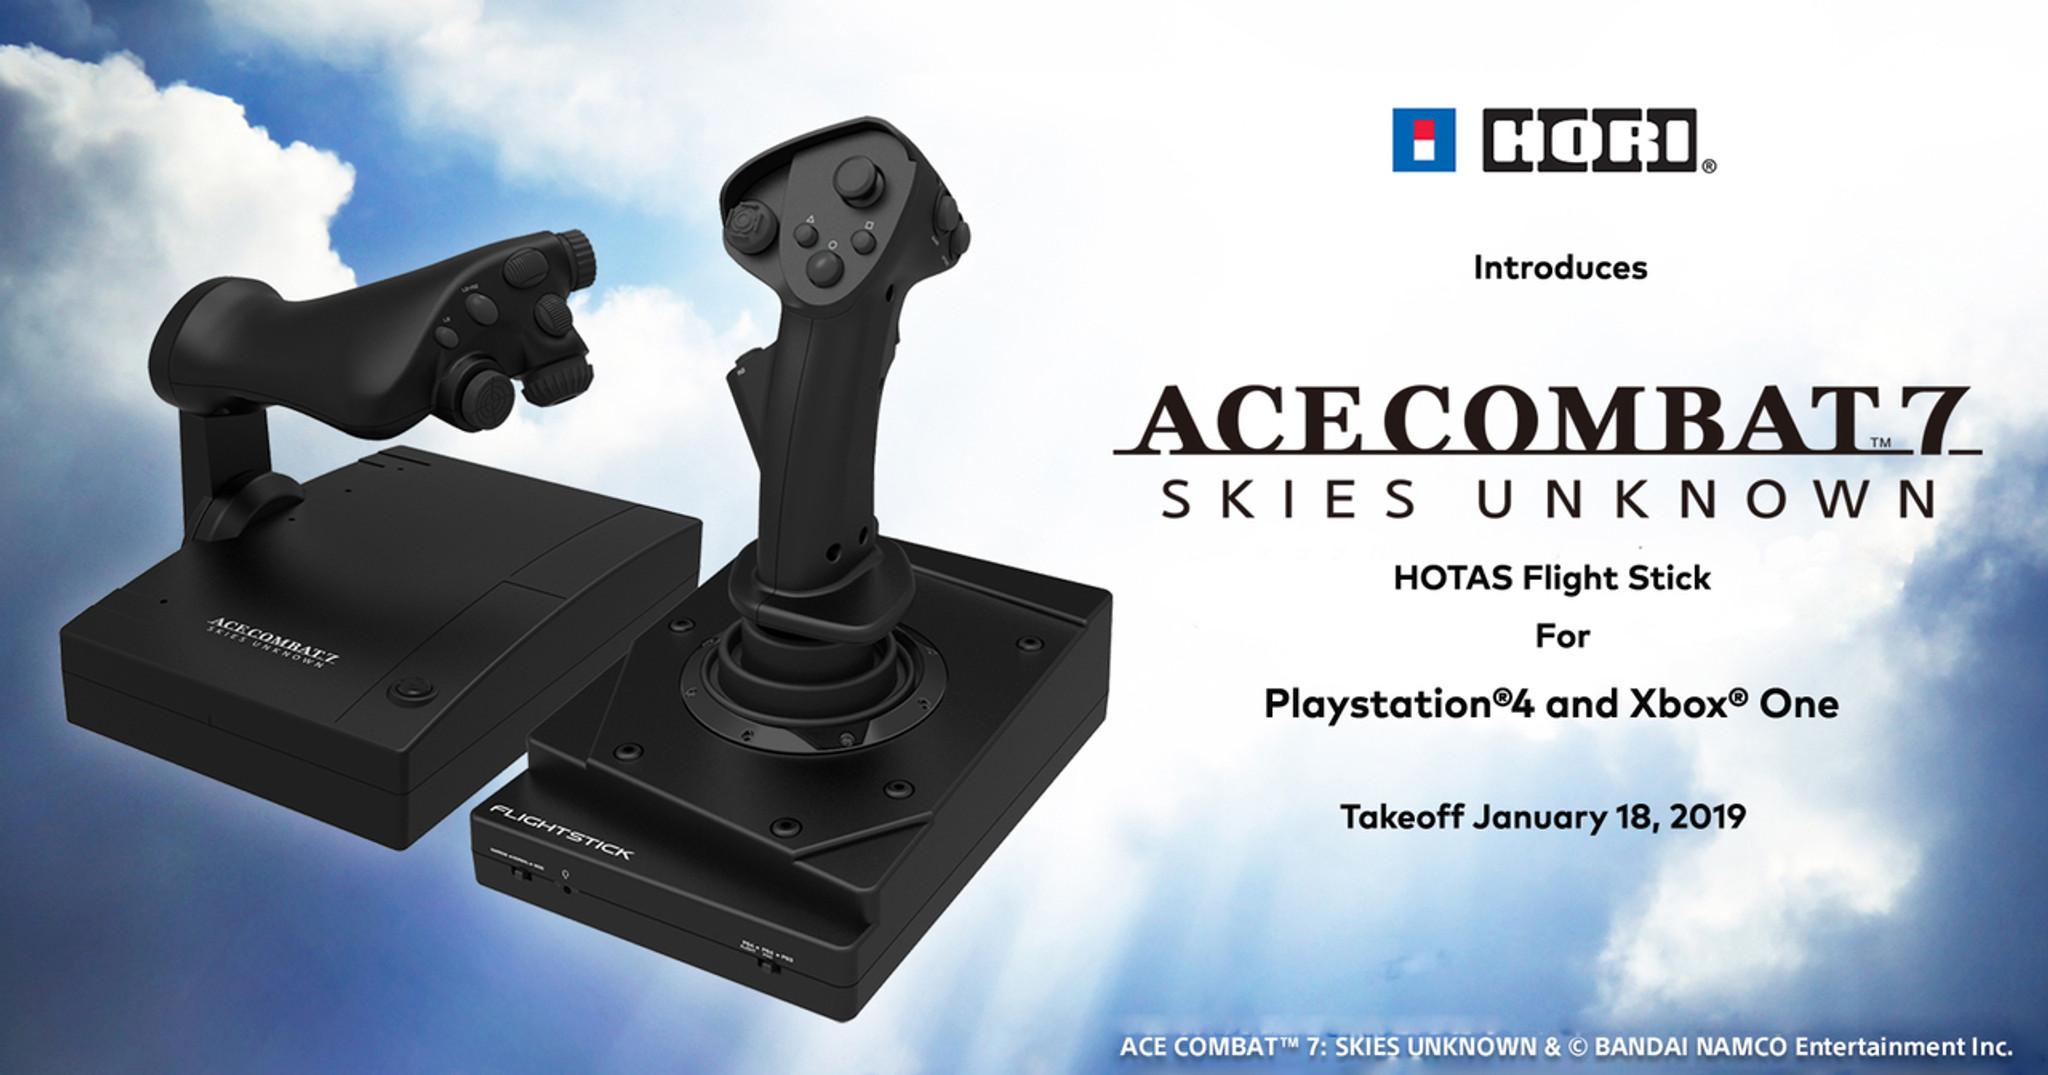 Ace Combat 7 HOTAS Flight Stick for PlayStation 4